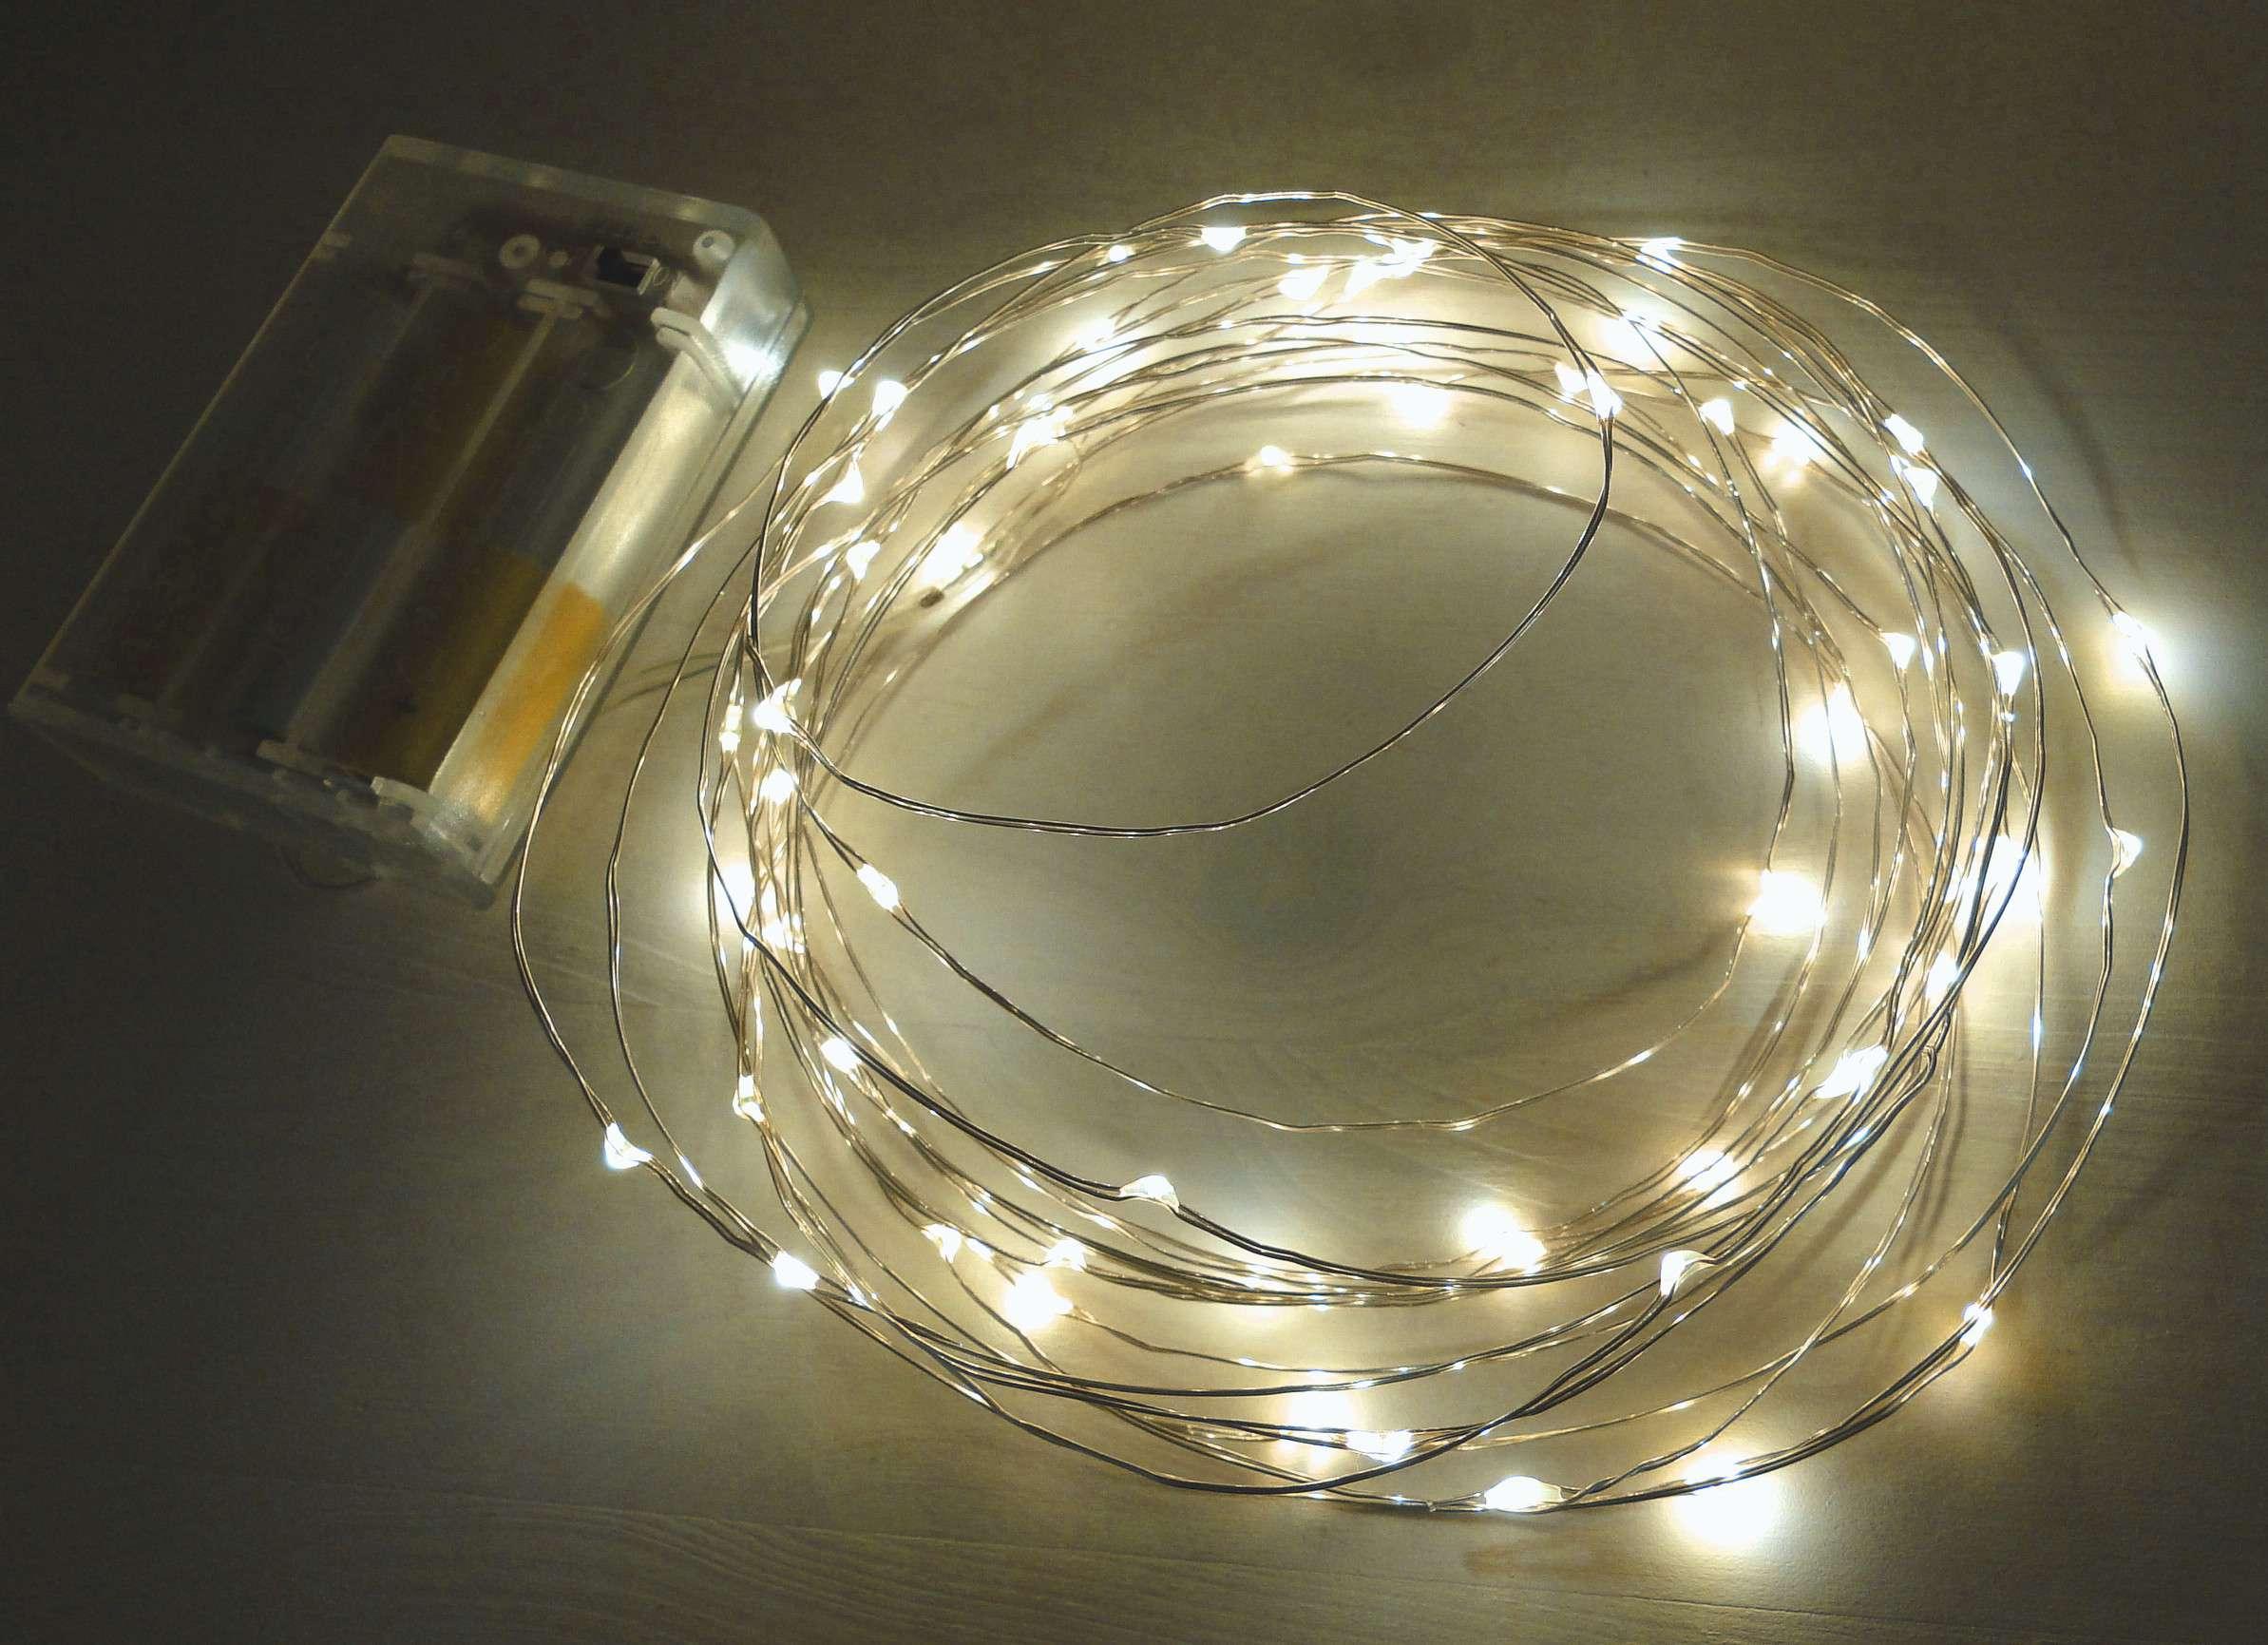 60er-Draht56275e48a124f_1280x1280@2x Schöne Mini Led Lichterkette Batterie Dekorationen